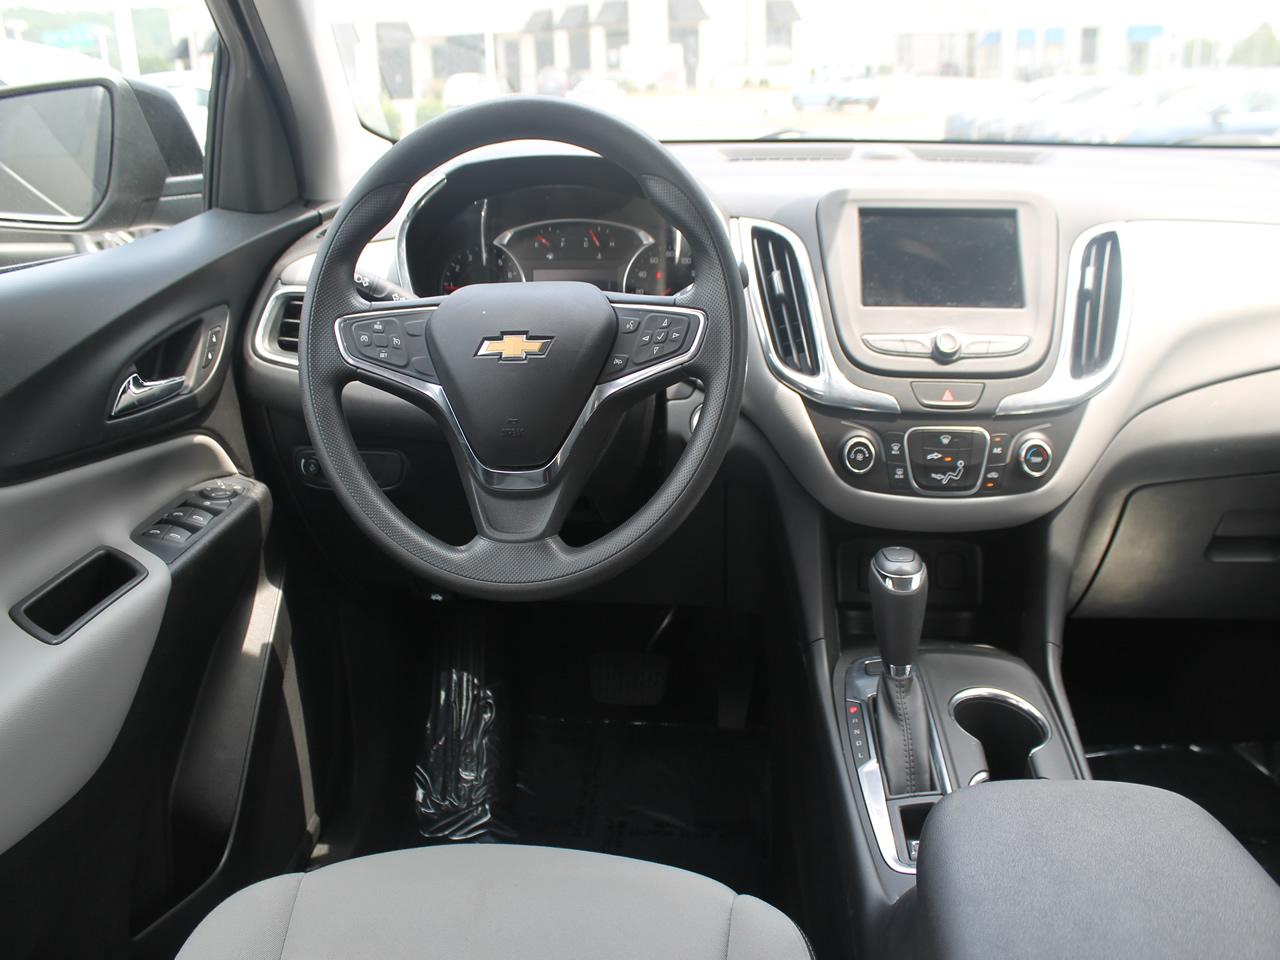 Dick Smith Hyundai >> USED 2019 CHEVROLET EQUINOX LT 1.5T AWD VIN 3GNAXUEV7KL119124 - Hyundai in Greenville | Hyundai ...